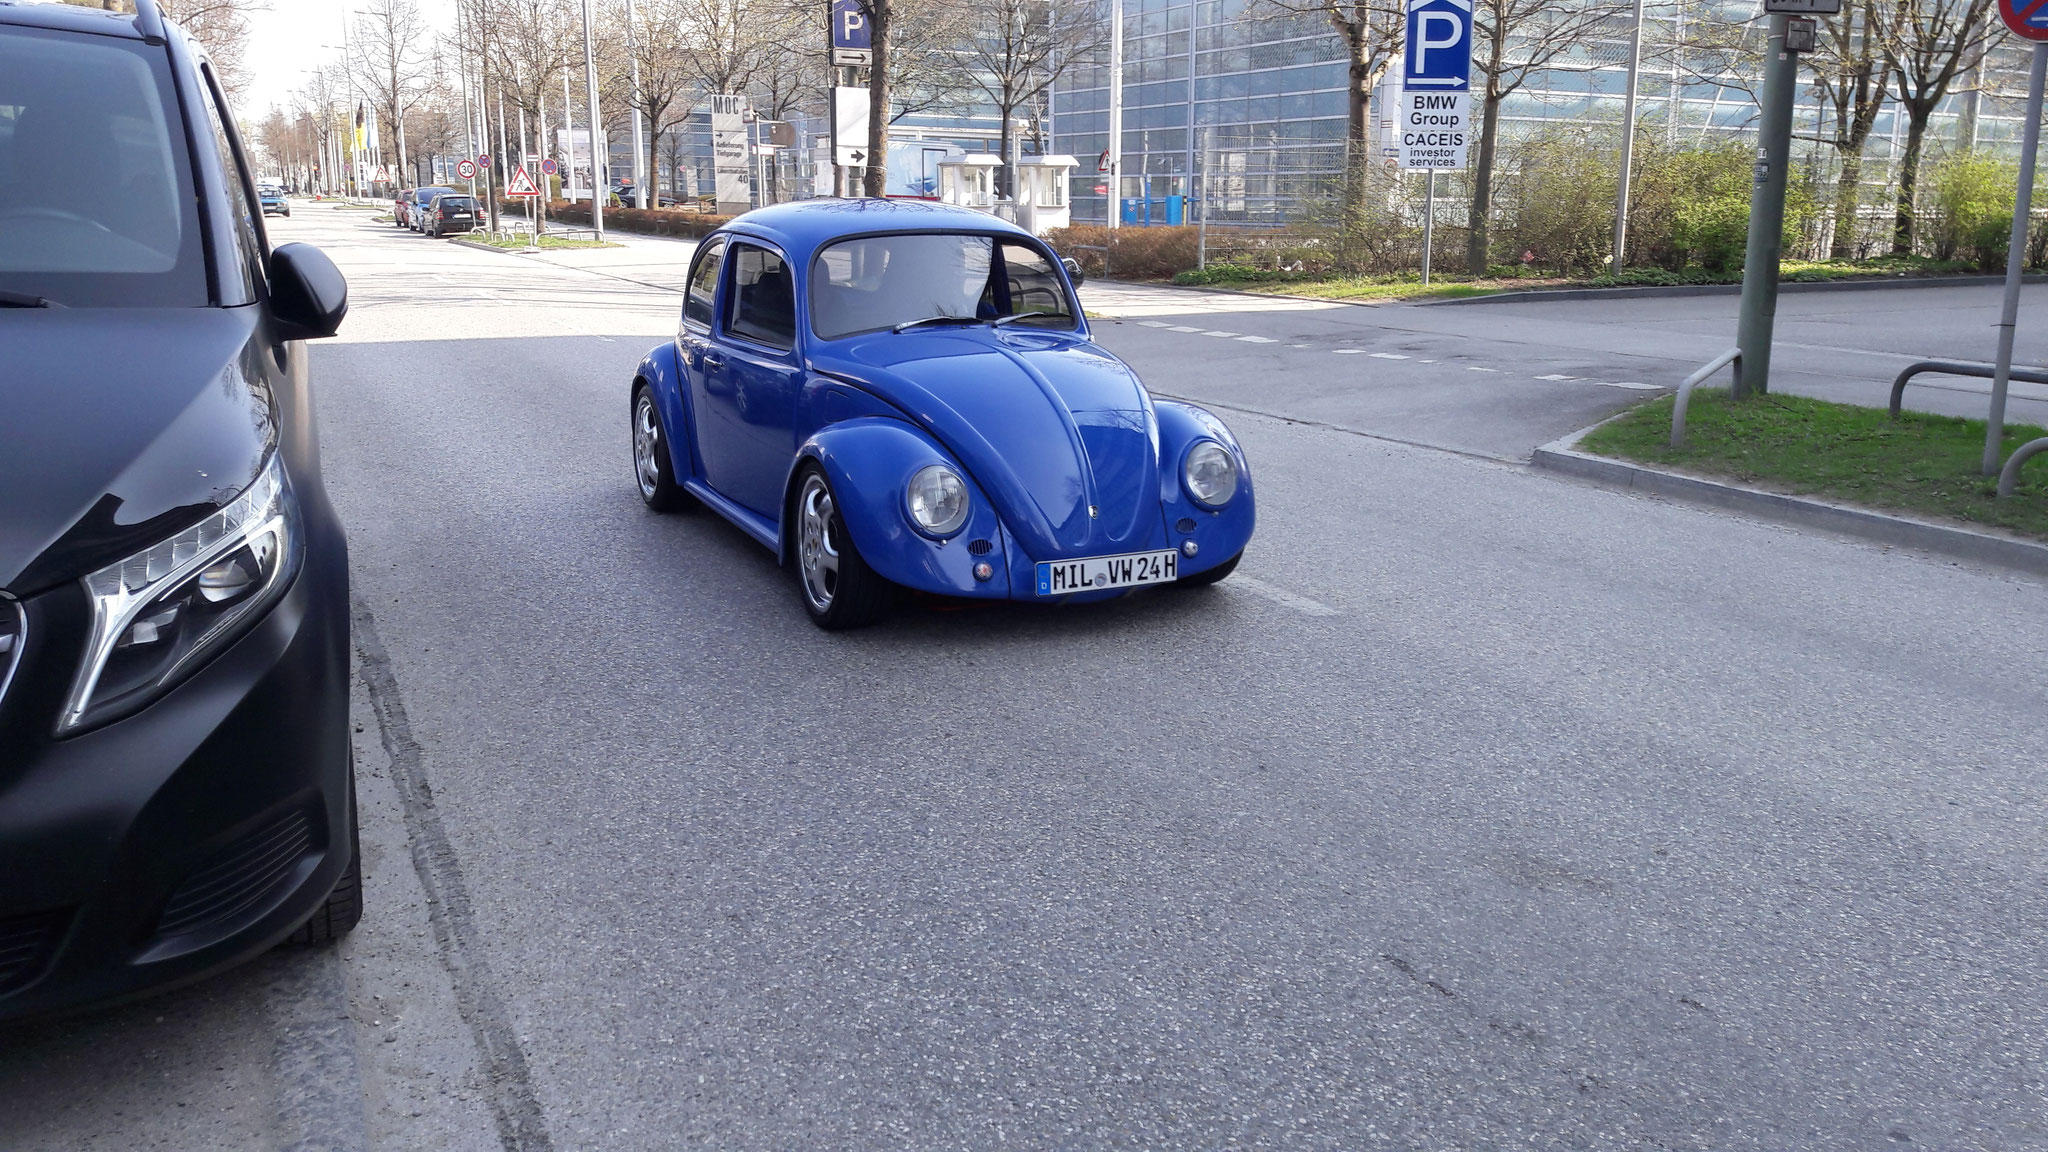 VW Käfer -MIL-VW-24H